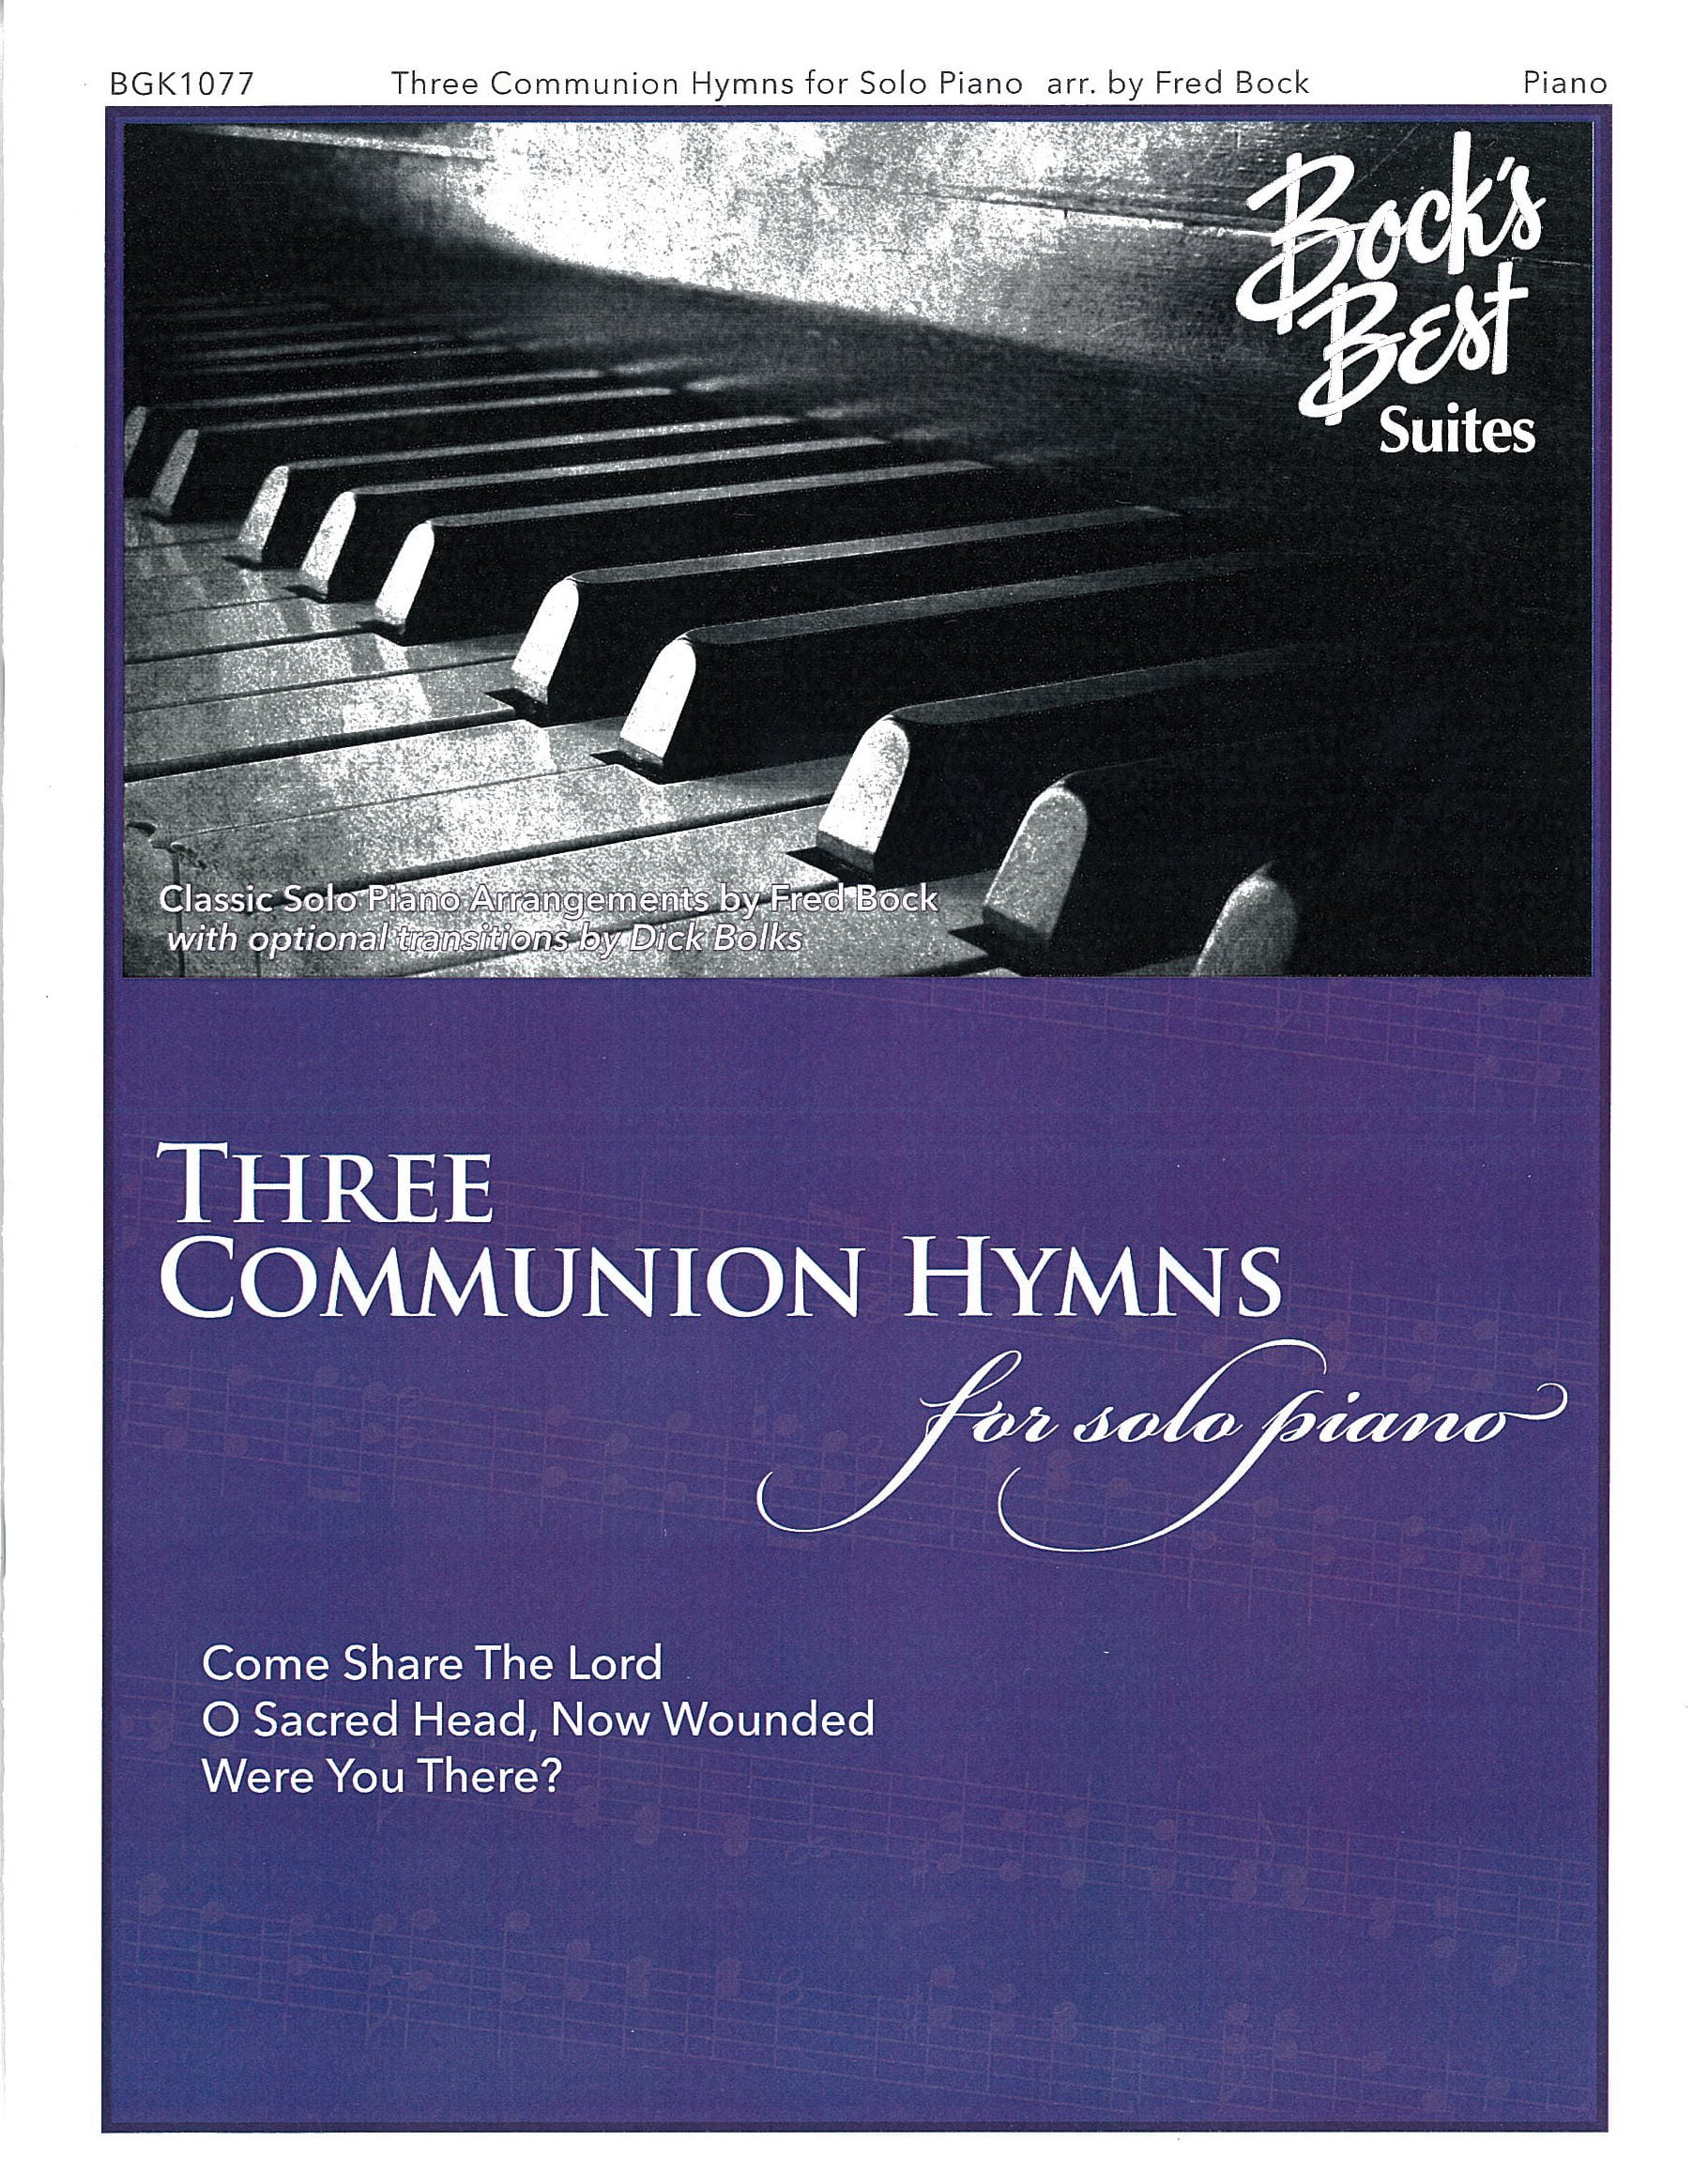 Three Communion Hymns